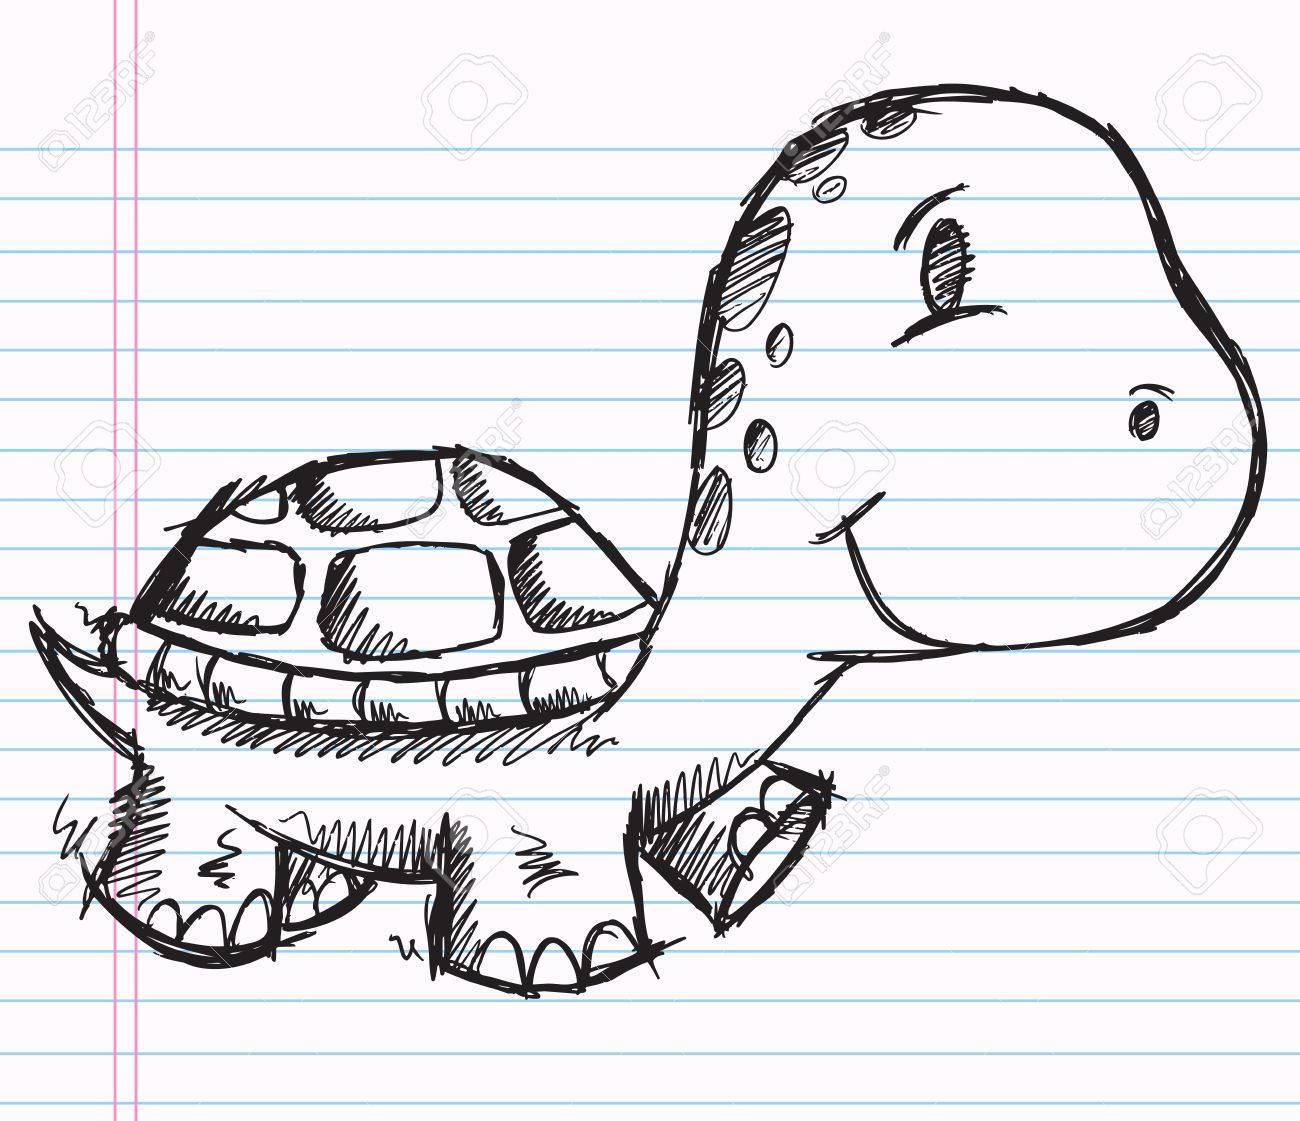 Notebook Doodle Sketch Turtle Vector Illustration Drawing Art Stock Vector 12151139